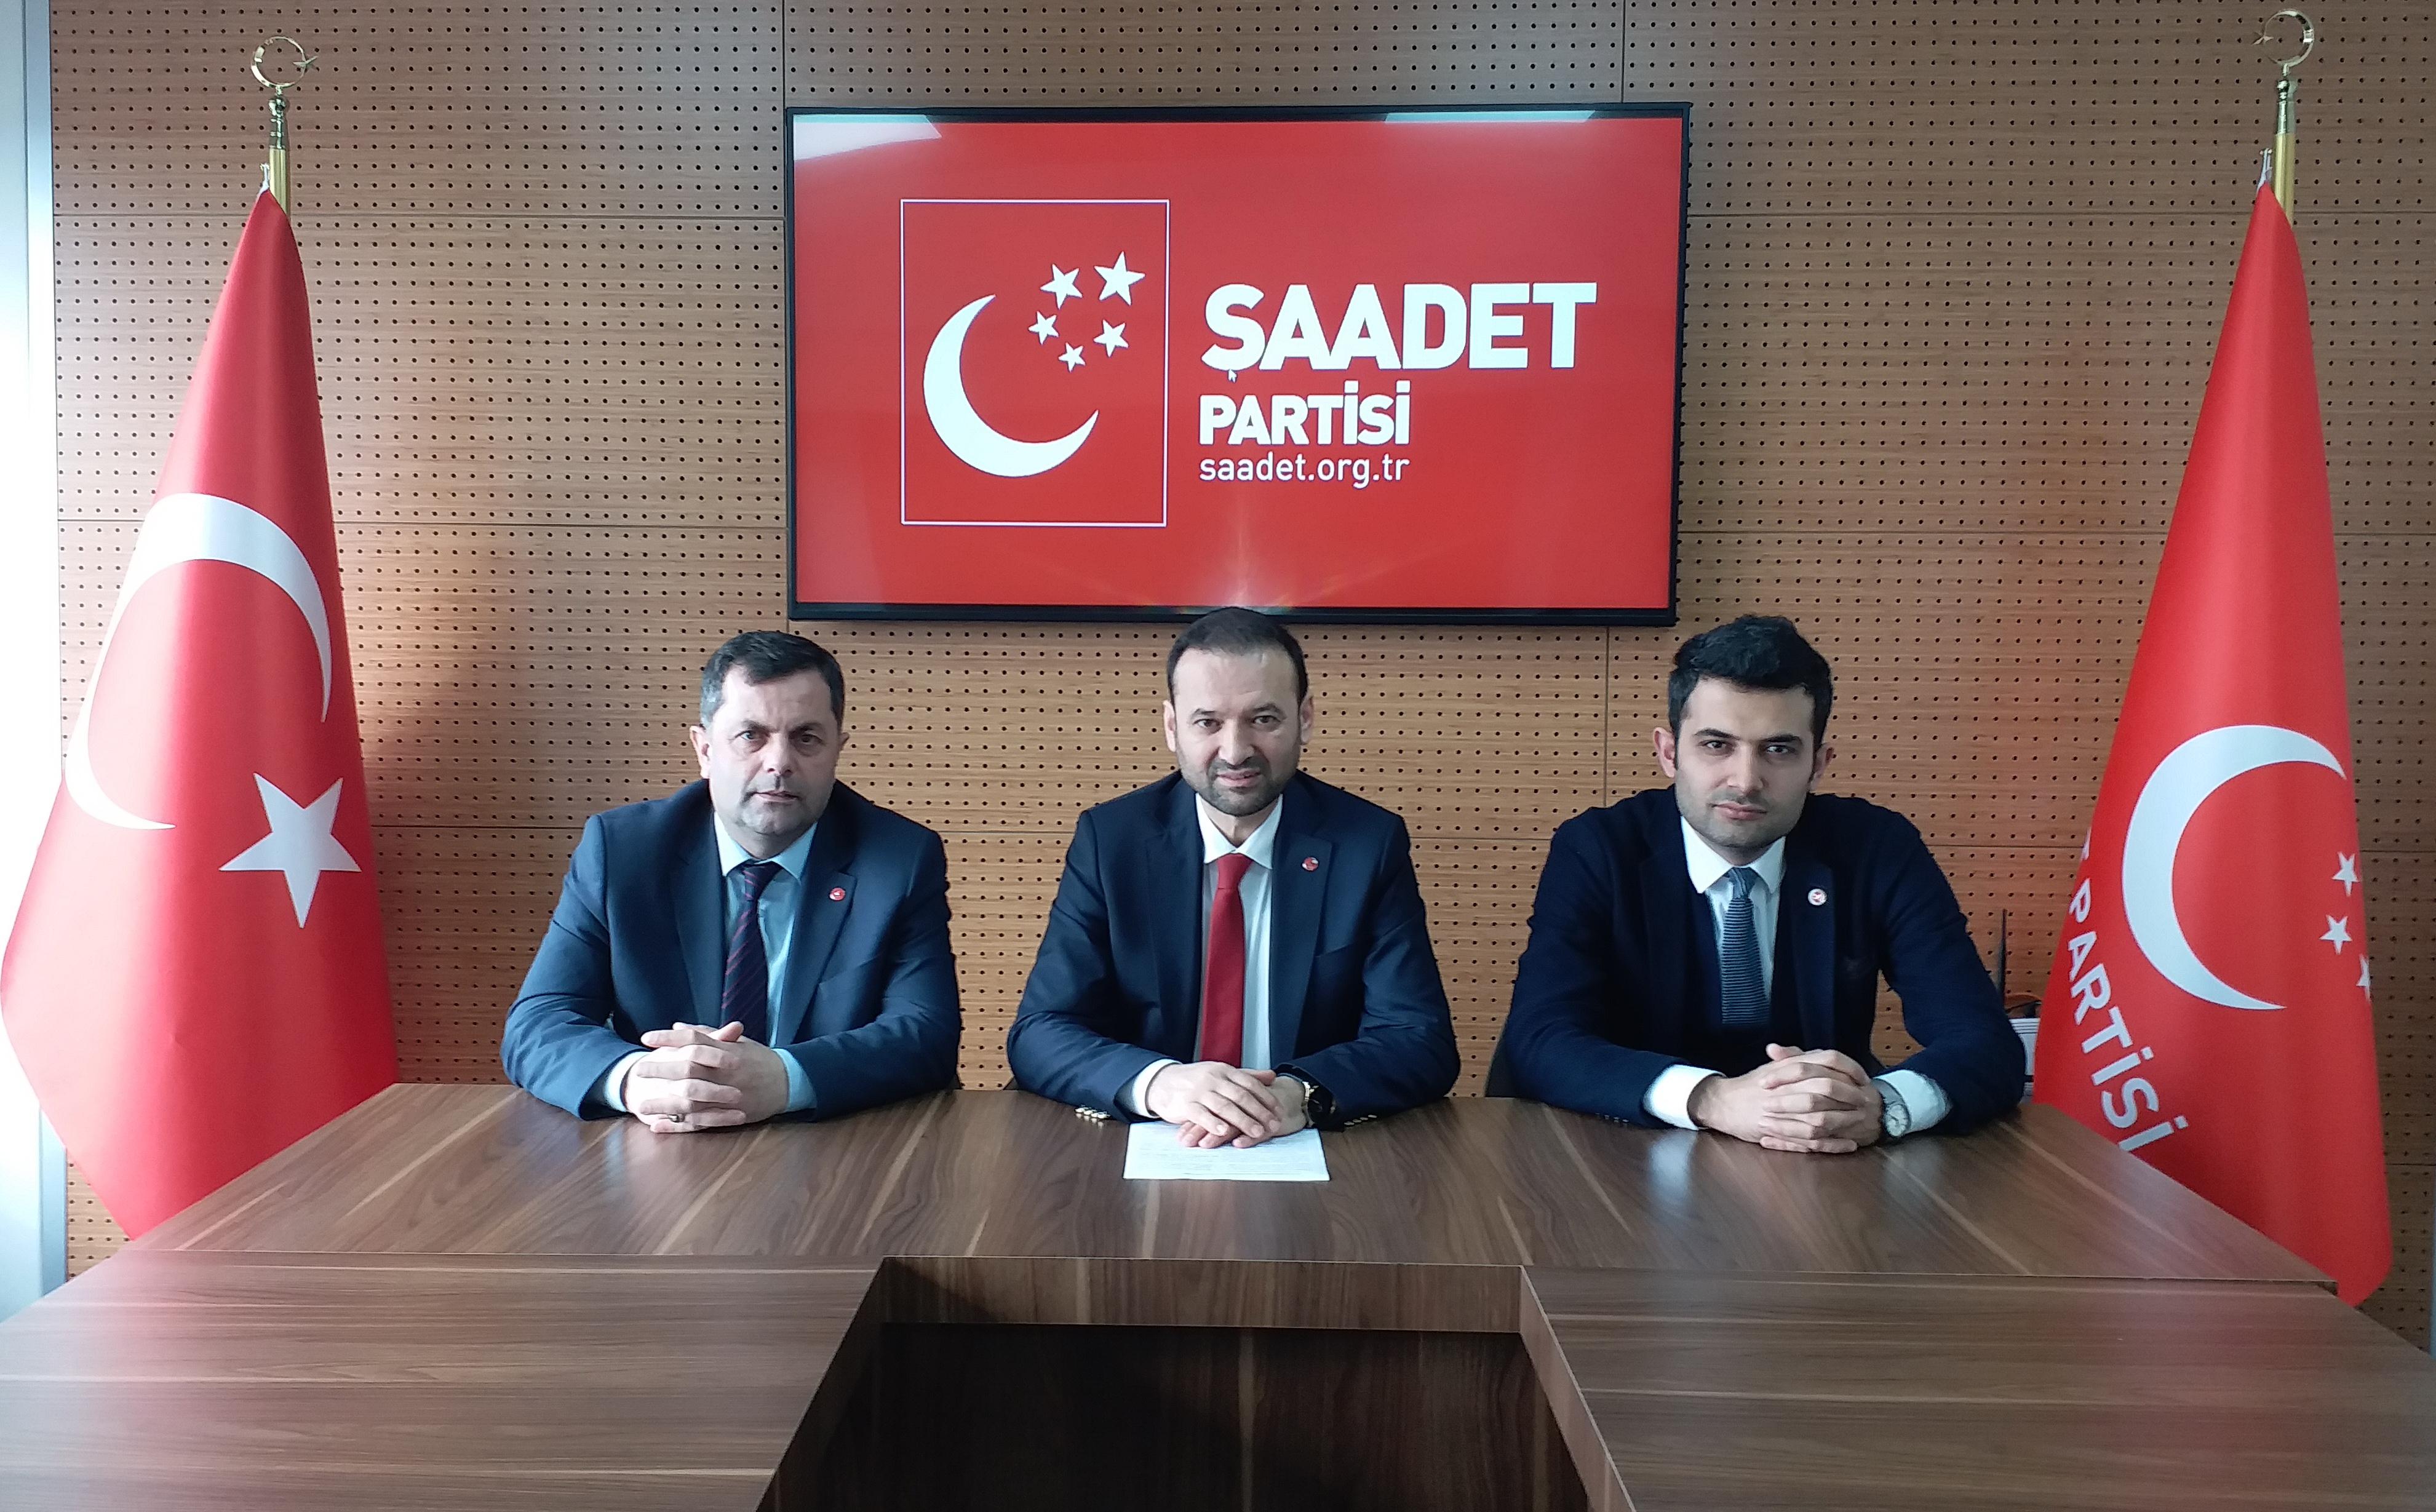 """Saadet Partisi sevgi dilini kullanıyor"""